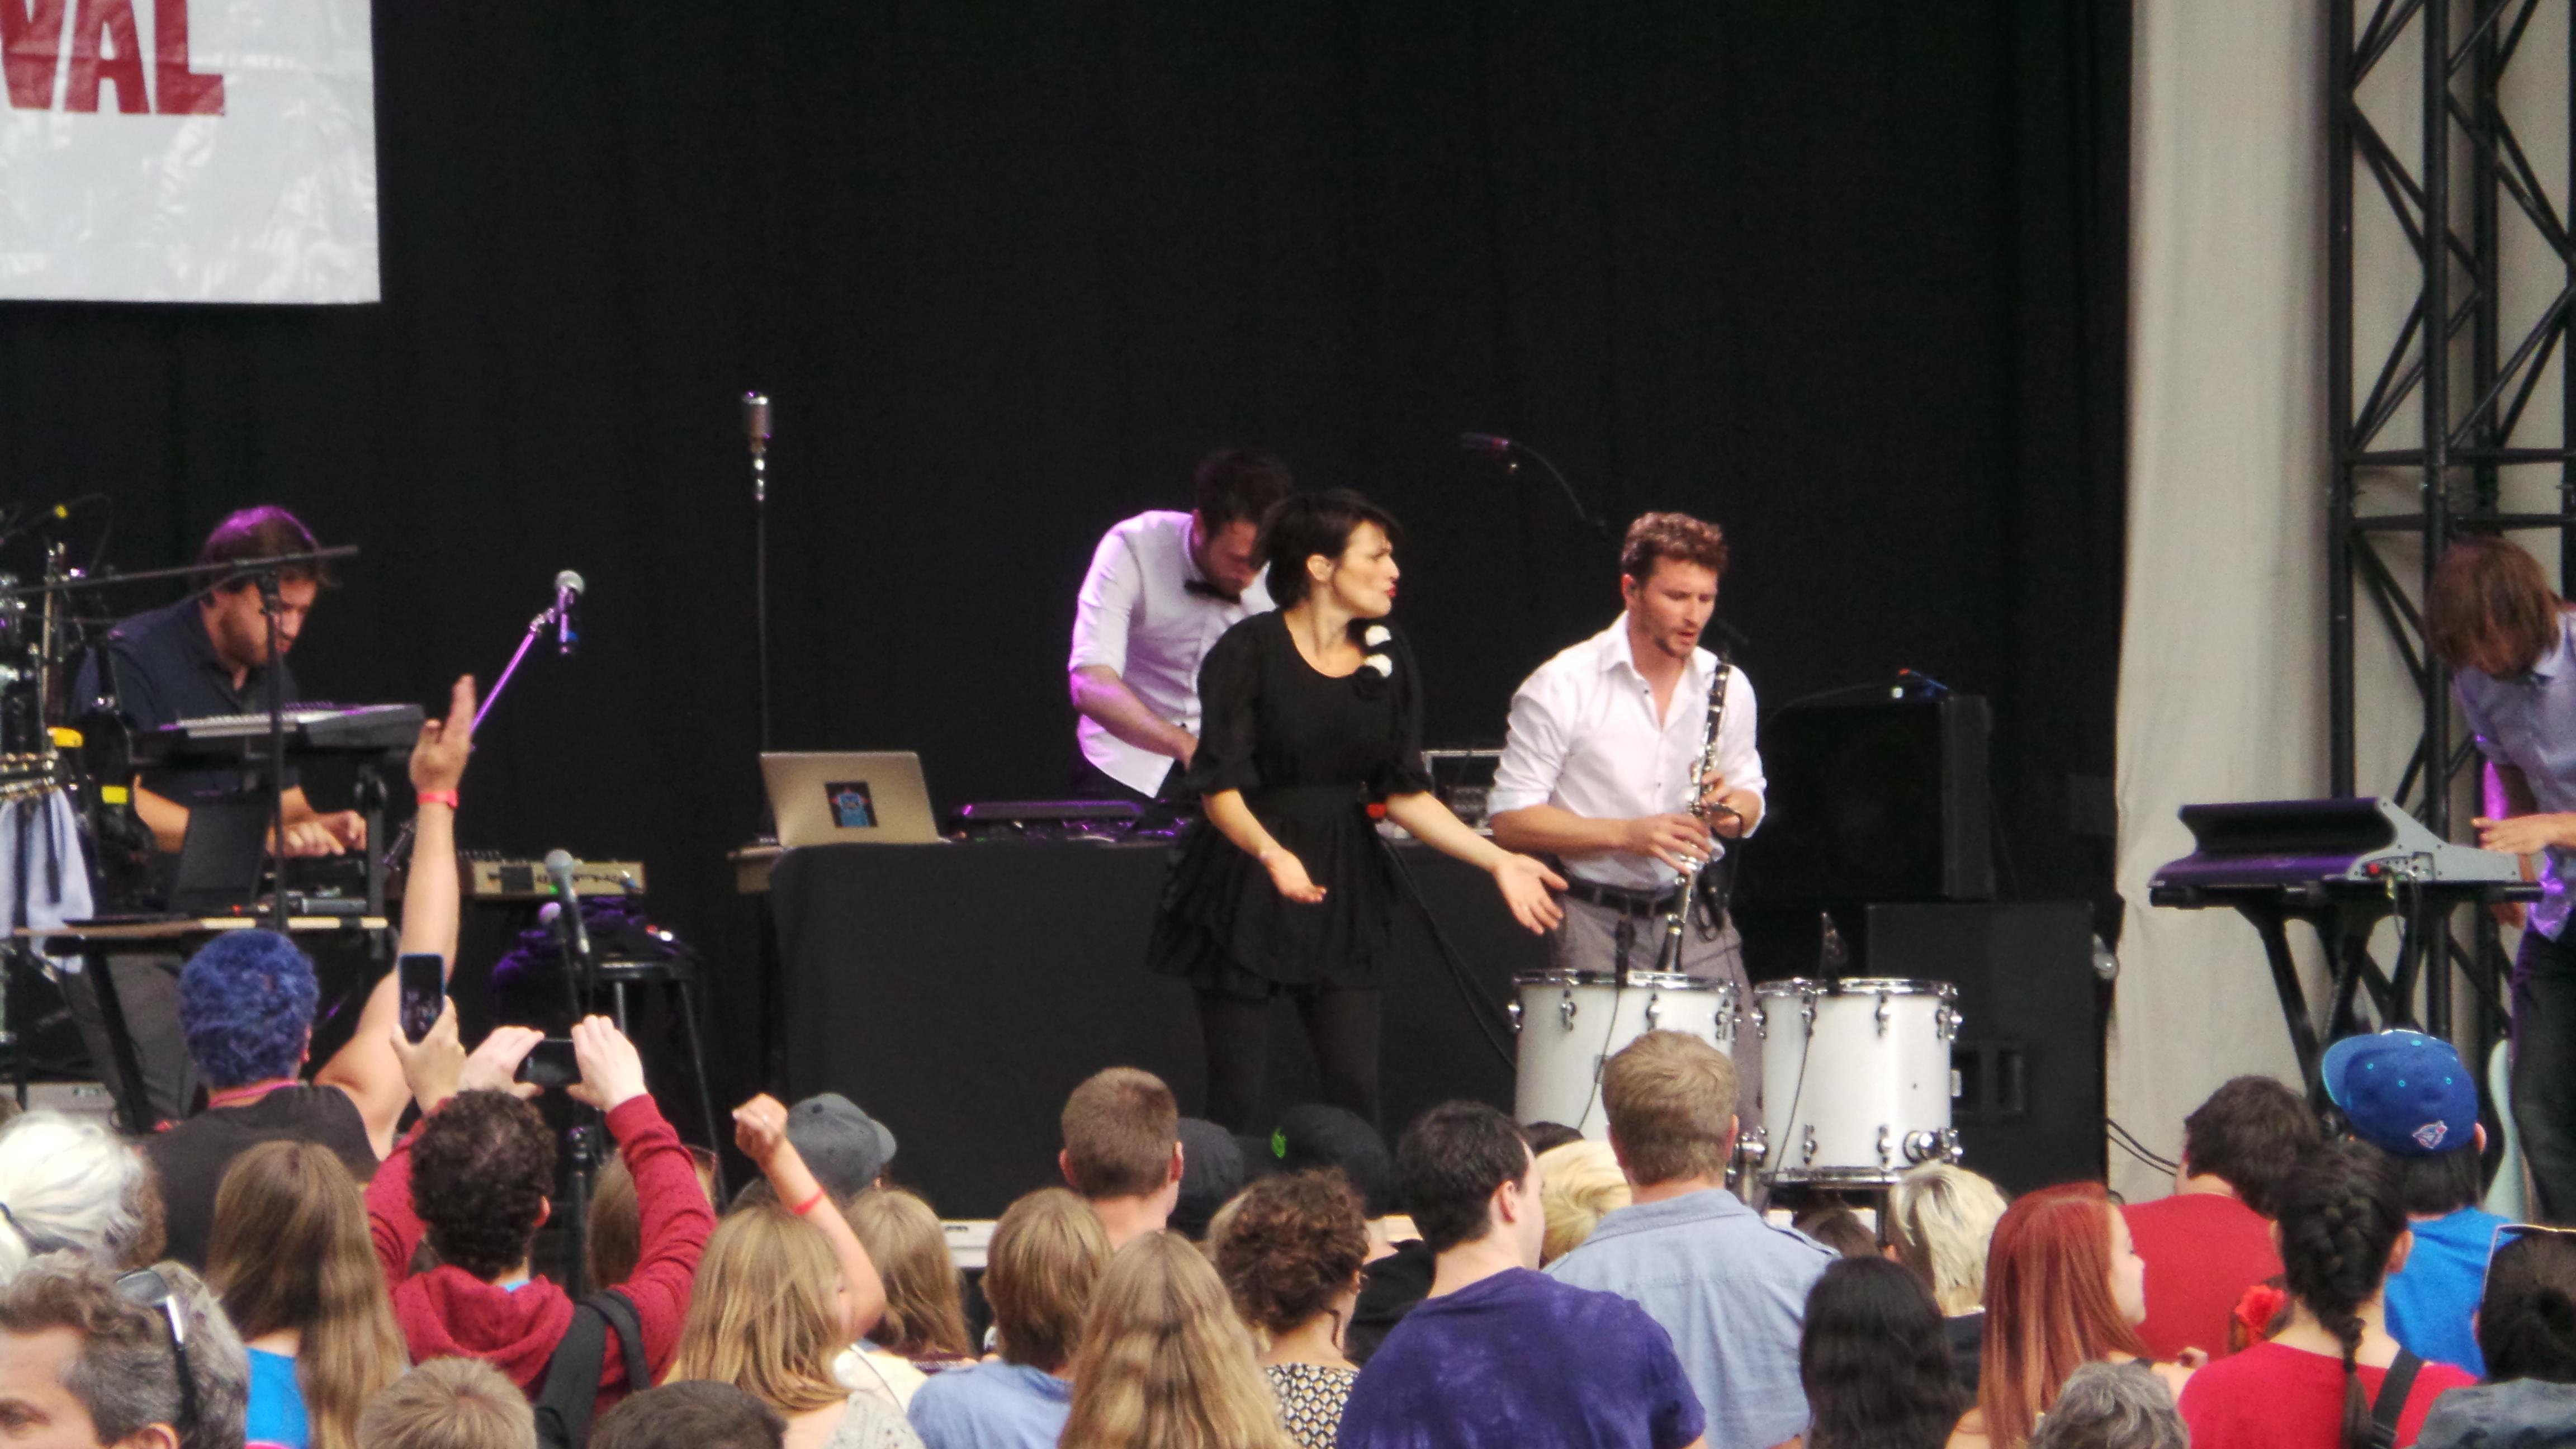 Calgary Folk Music Festival Find: Caravan Palace!